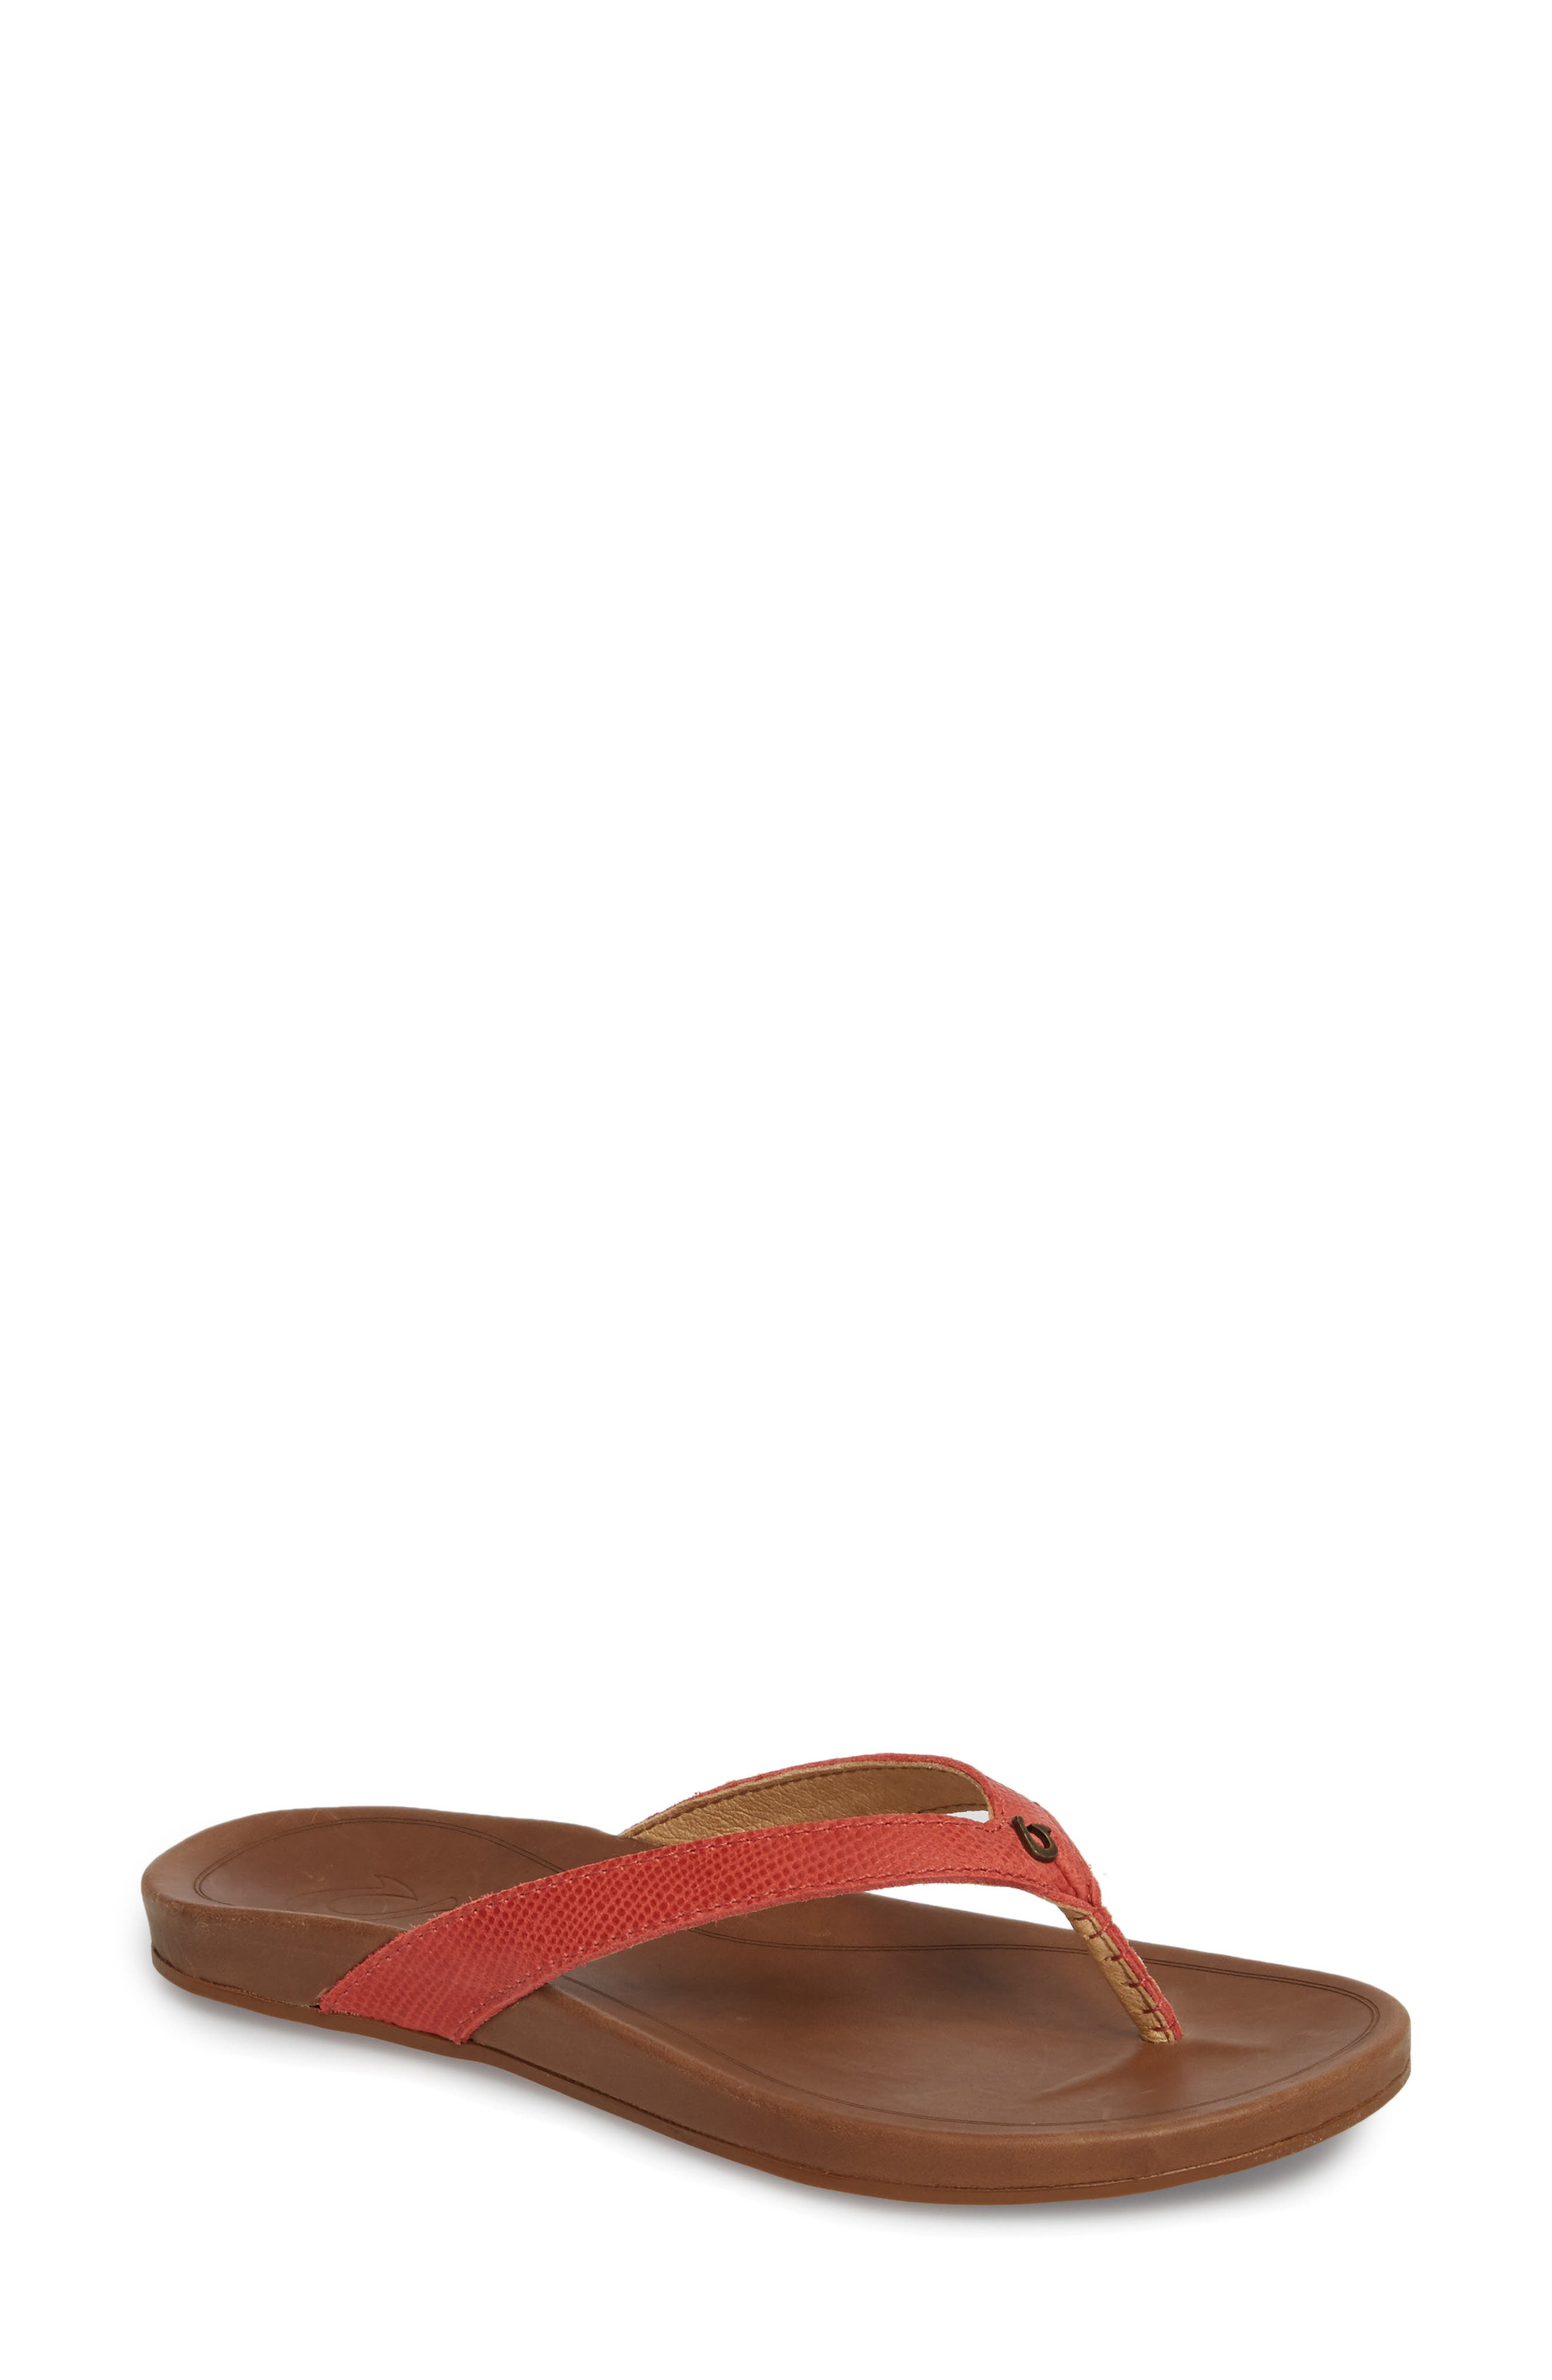 'Hi Ona' Flip Flop,                         Main,                         color, Paprika/ Tan Leather